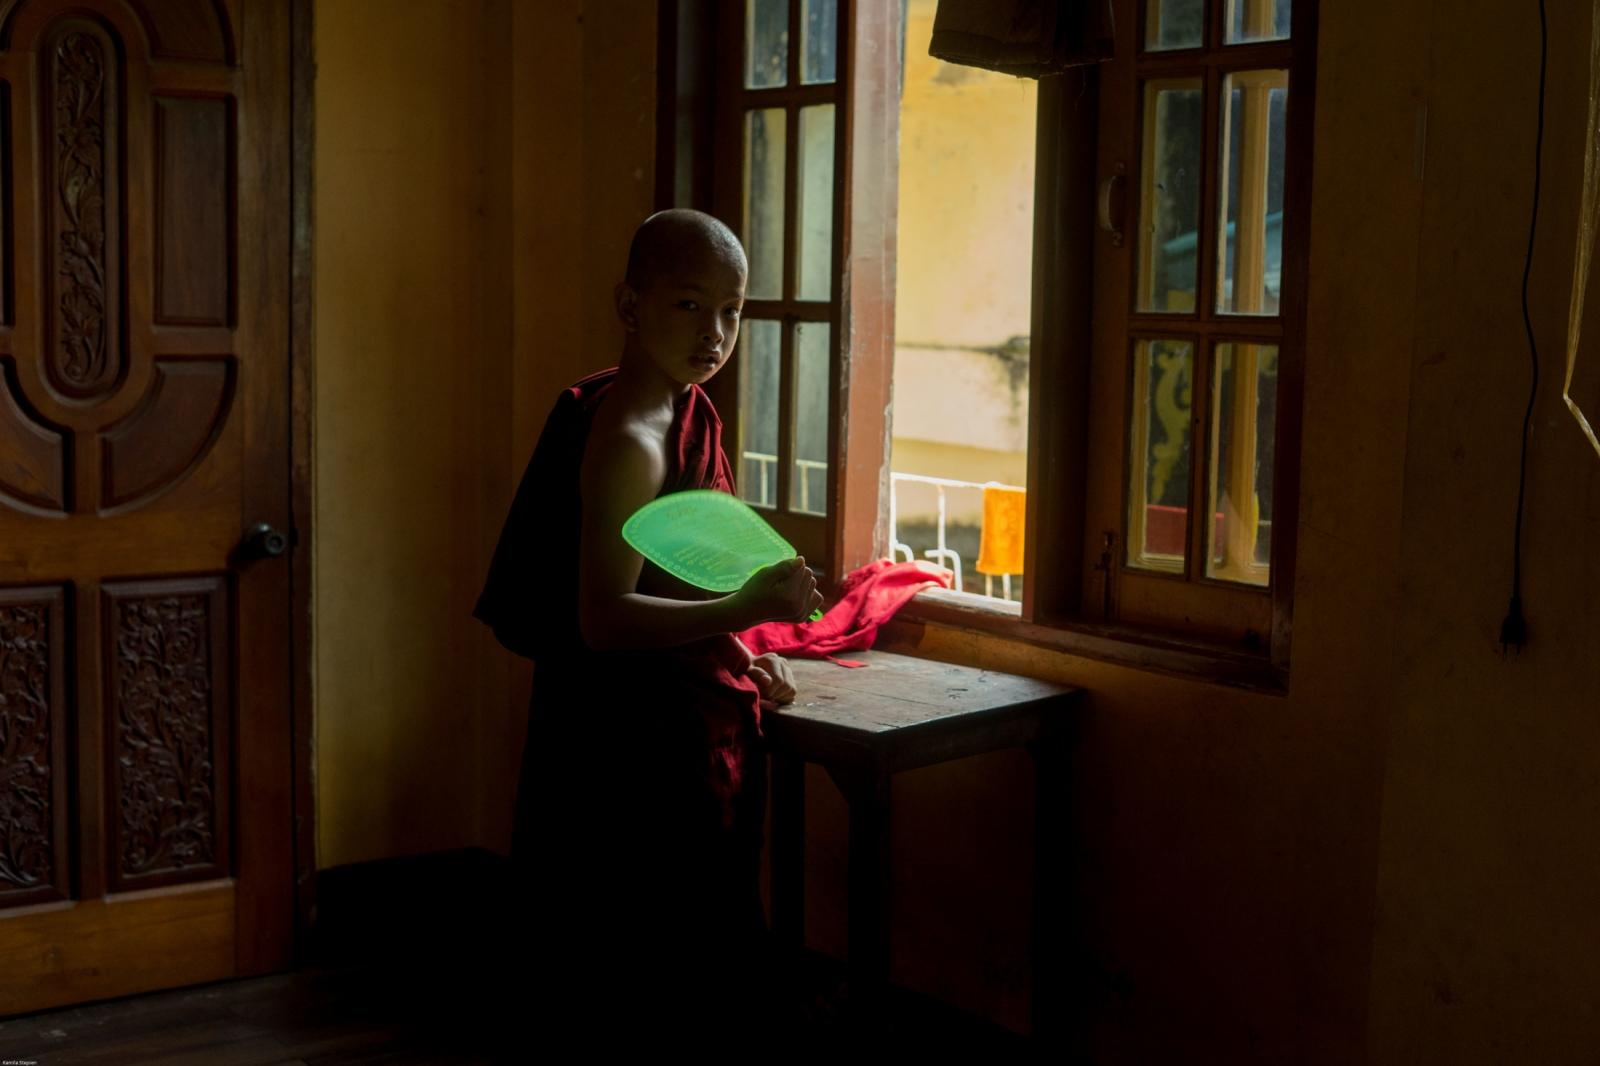 Photography image - Loading KS-Extremist_monks_(13_sur_59).jpg